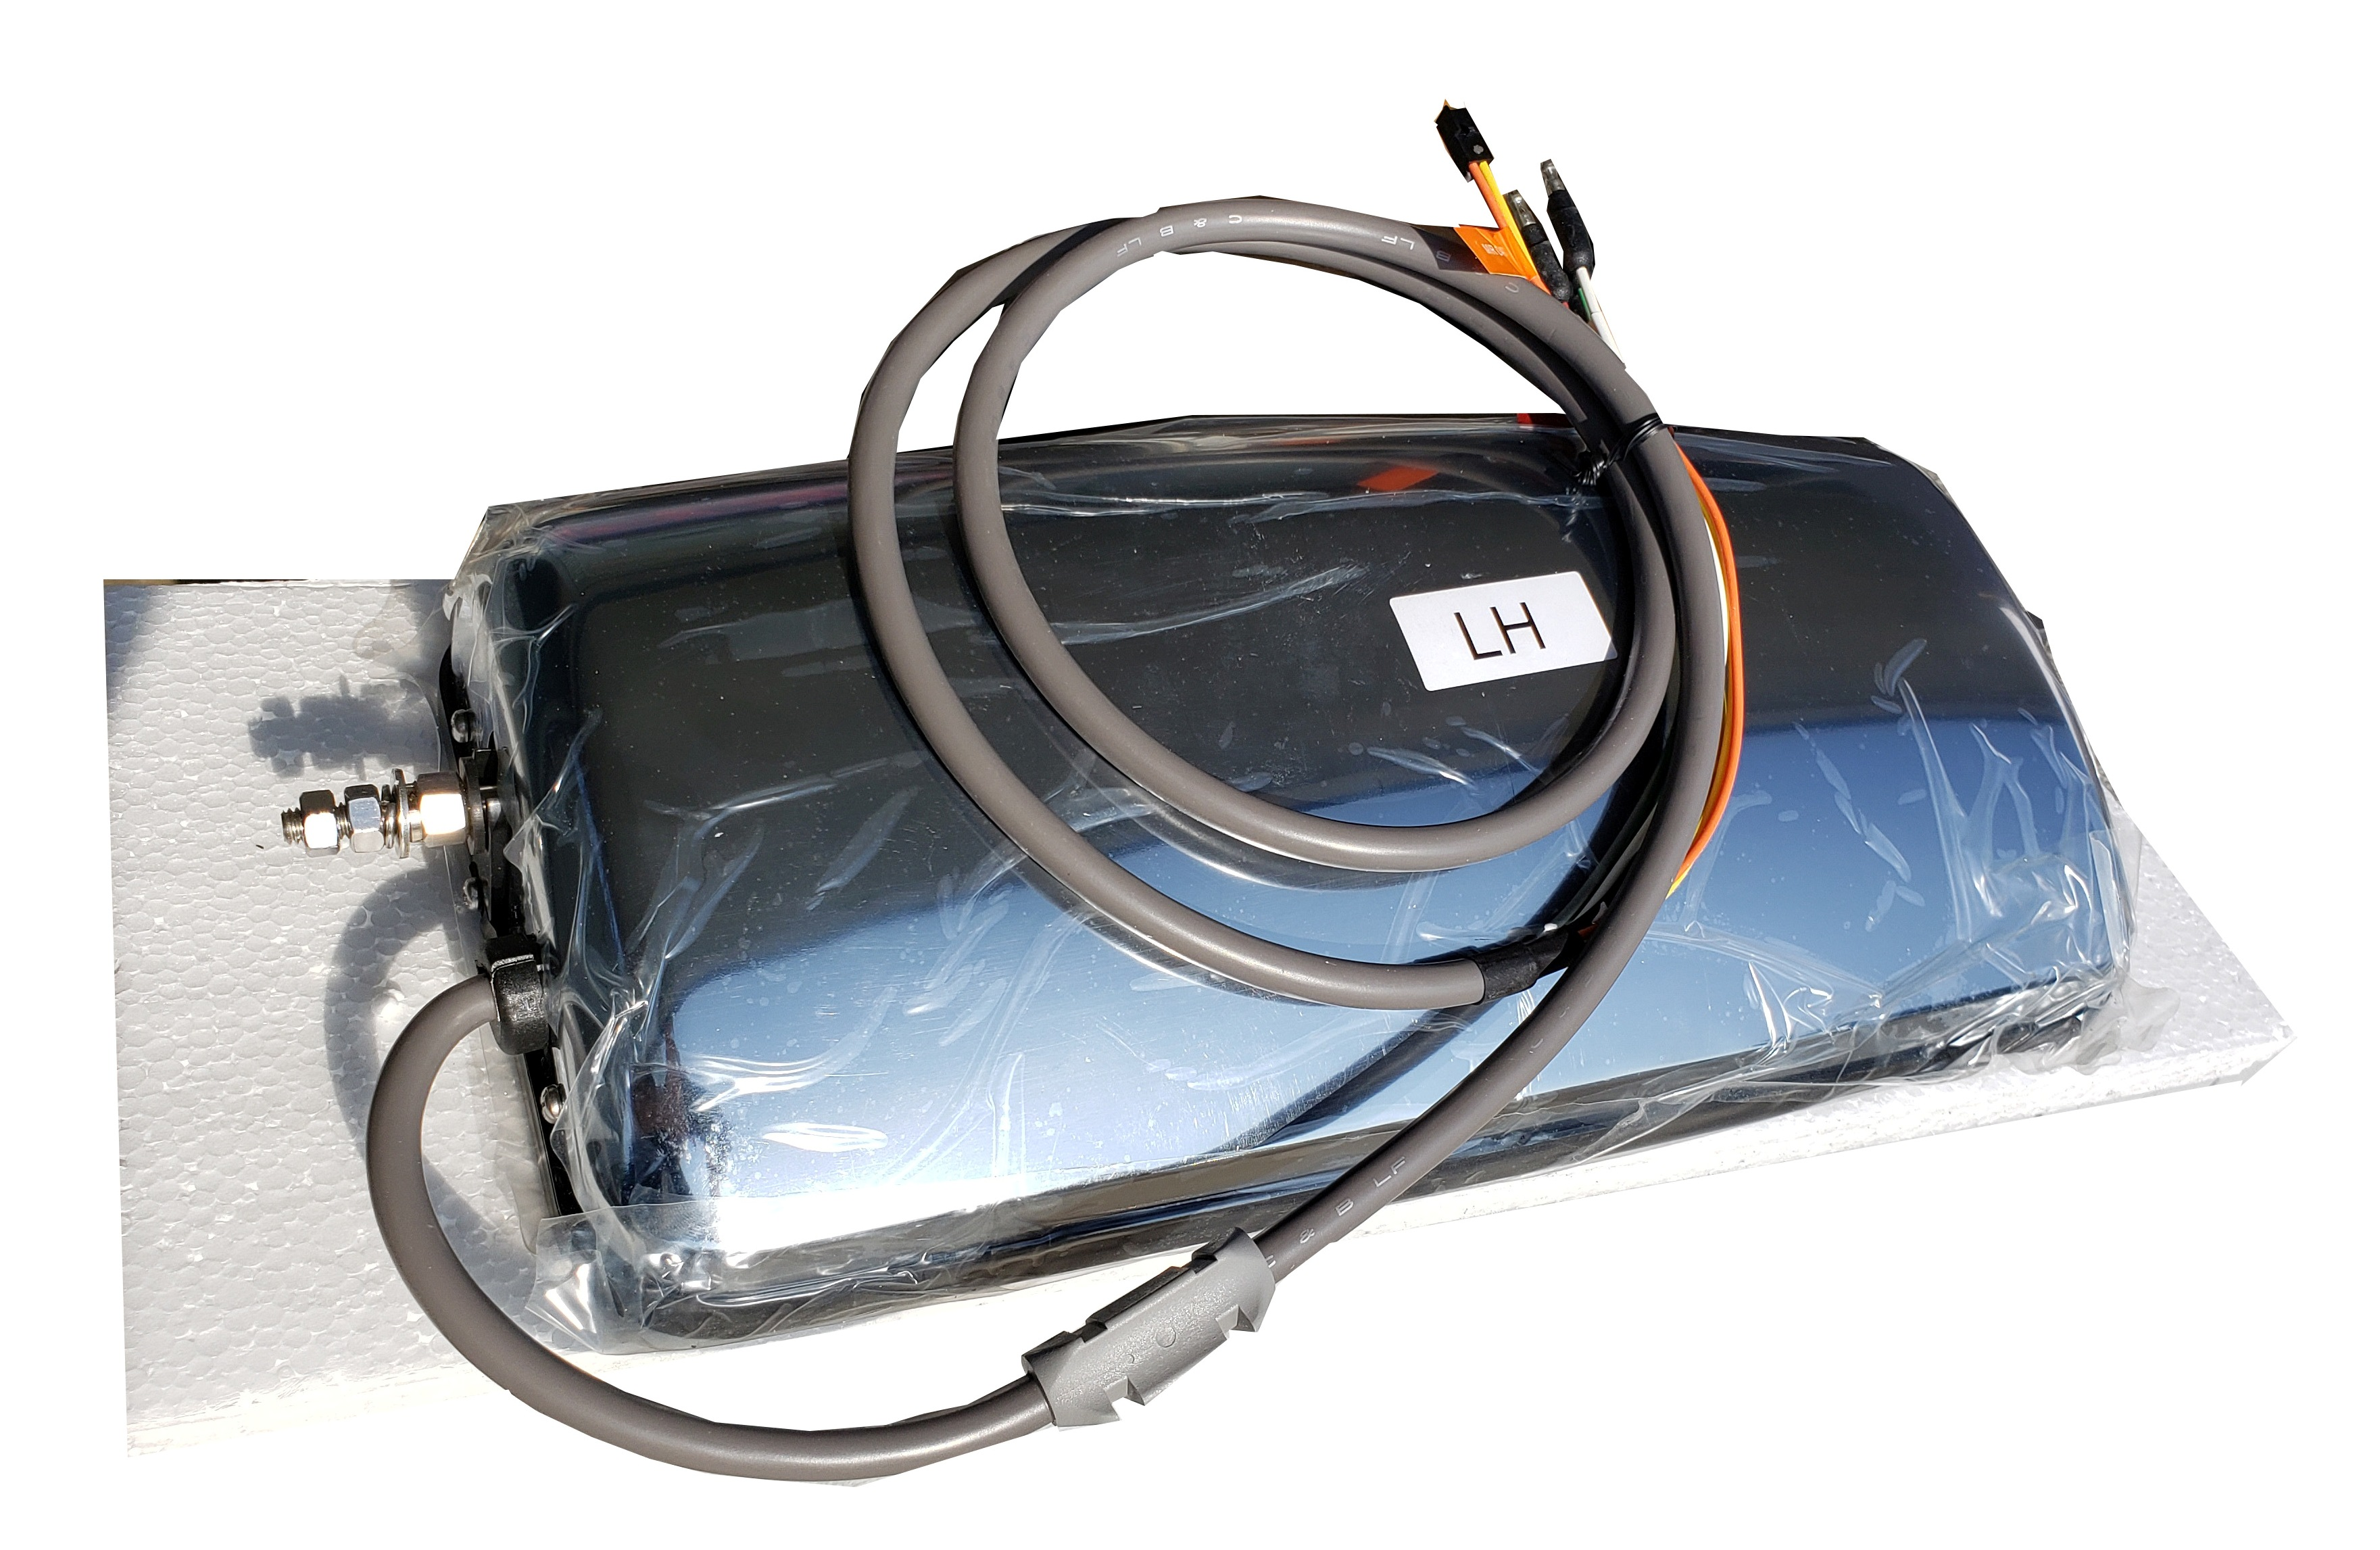 Peterbilt 389 Heated (L/H) West Coast Motor Mirror w/ Oat Sensor